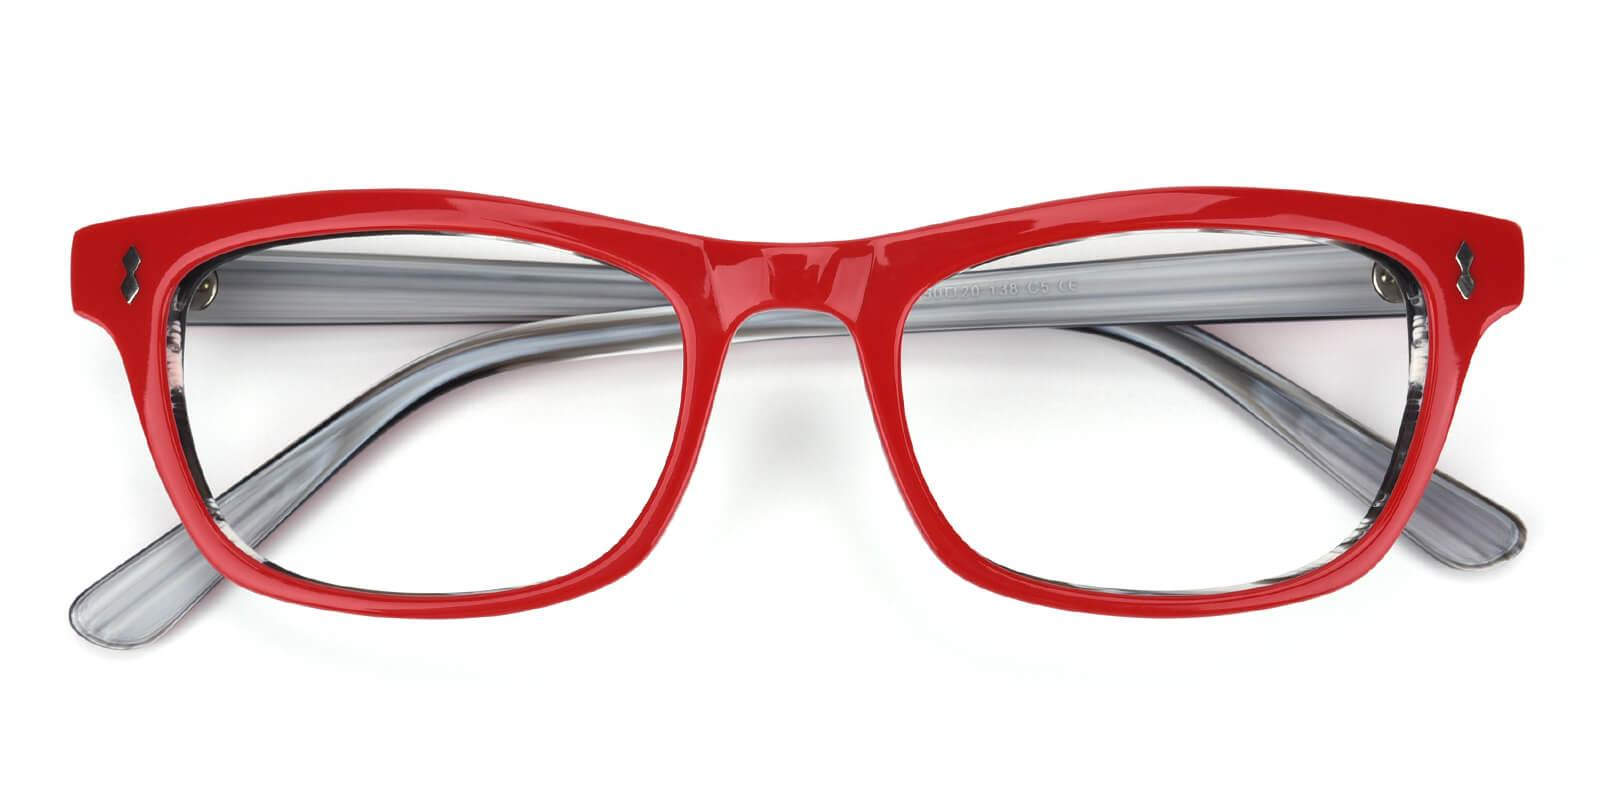 Leavary-Red-Rectangle-Acetate-Eyeglasses-detail